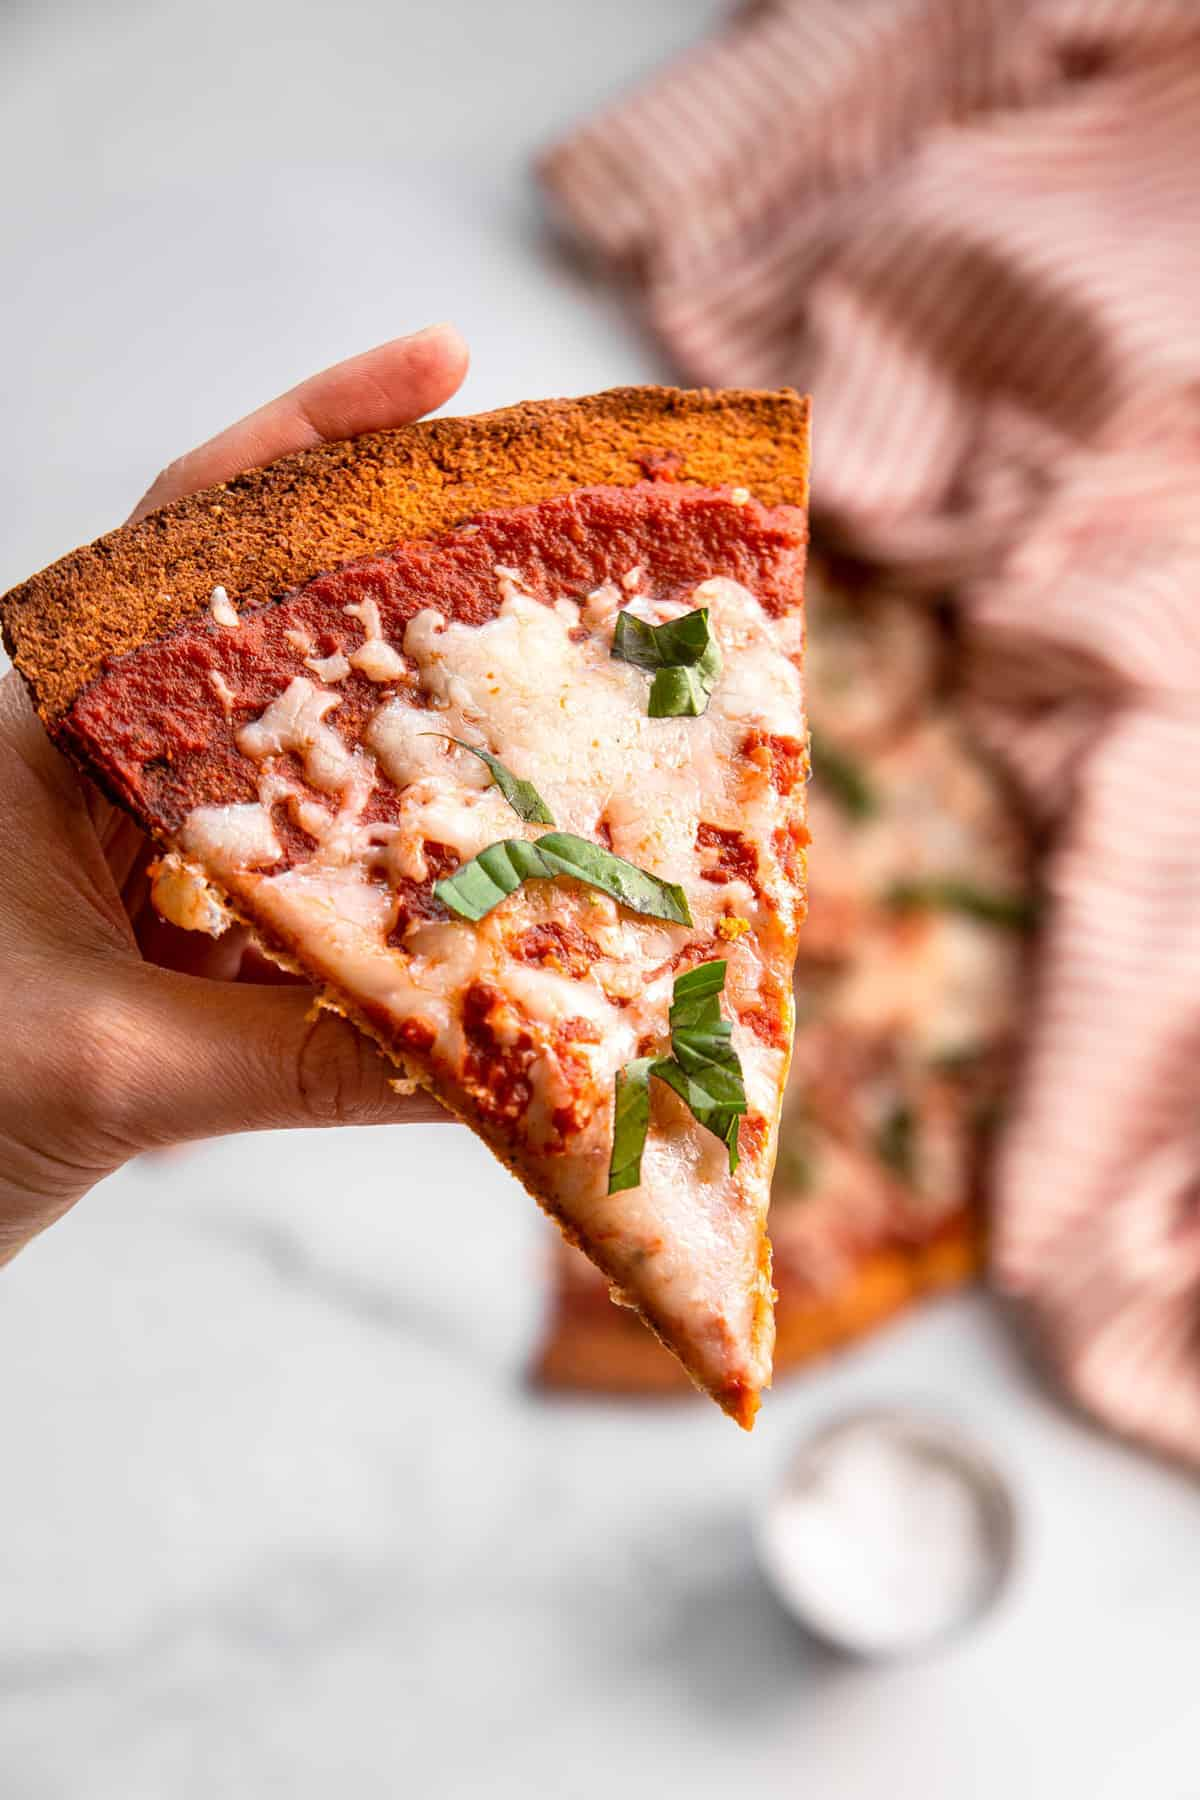 close up of Potato pizza crust cut into a slice